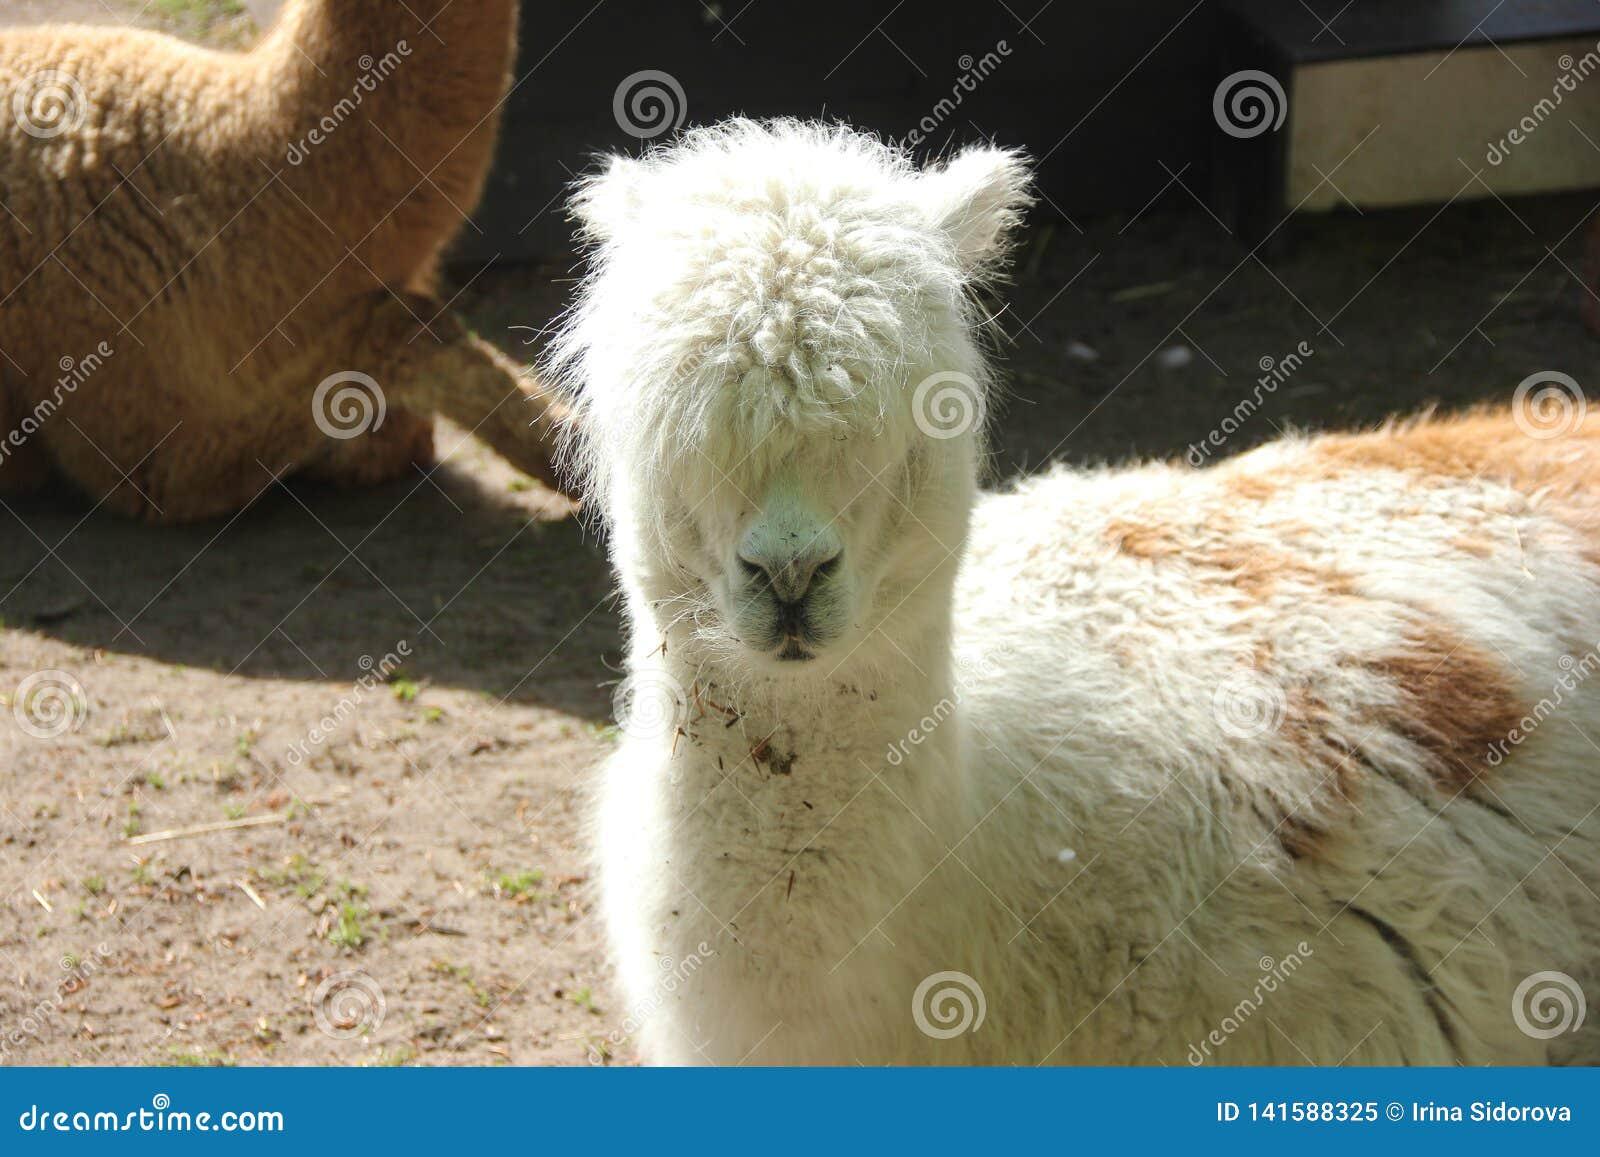 Close portrait of an alpaca with a long neck against a blue sky